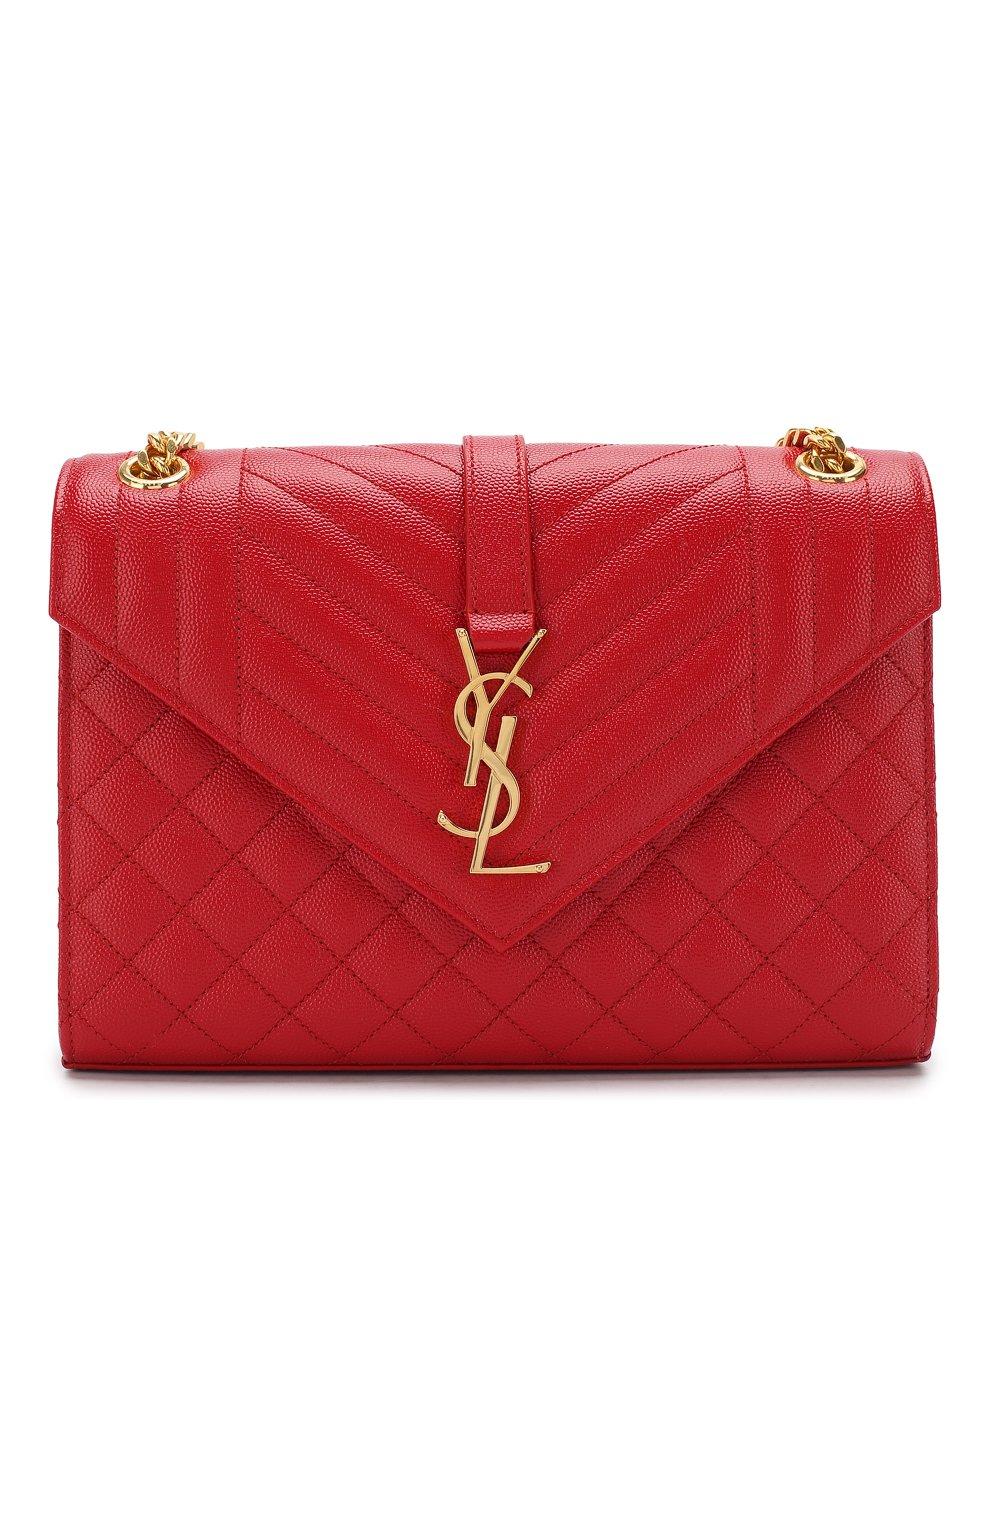 Сумка Classic Monogram medium Saint Laurent красная цвета | Фото №1